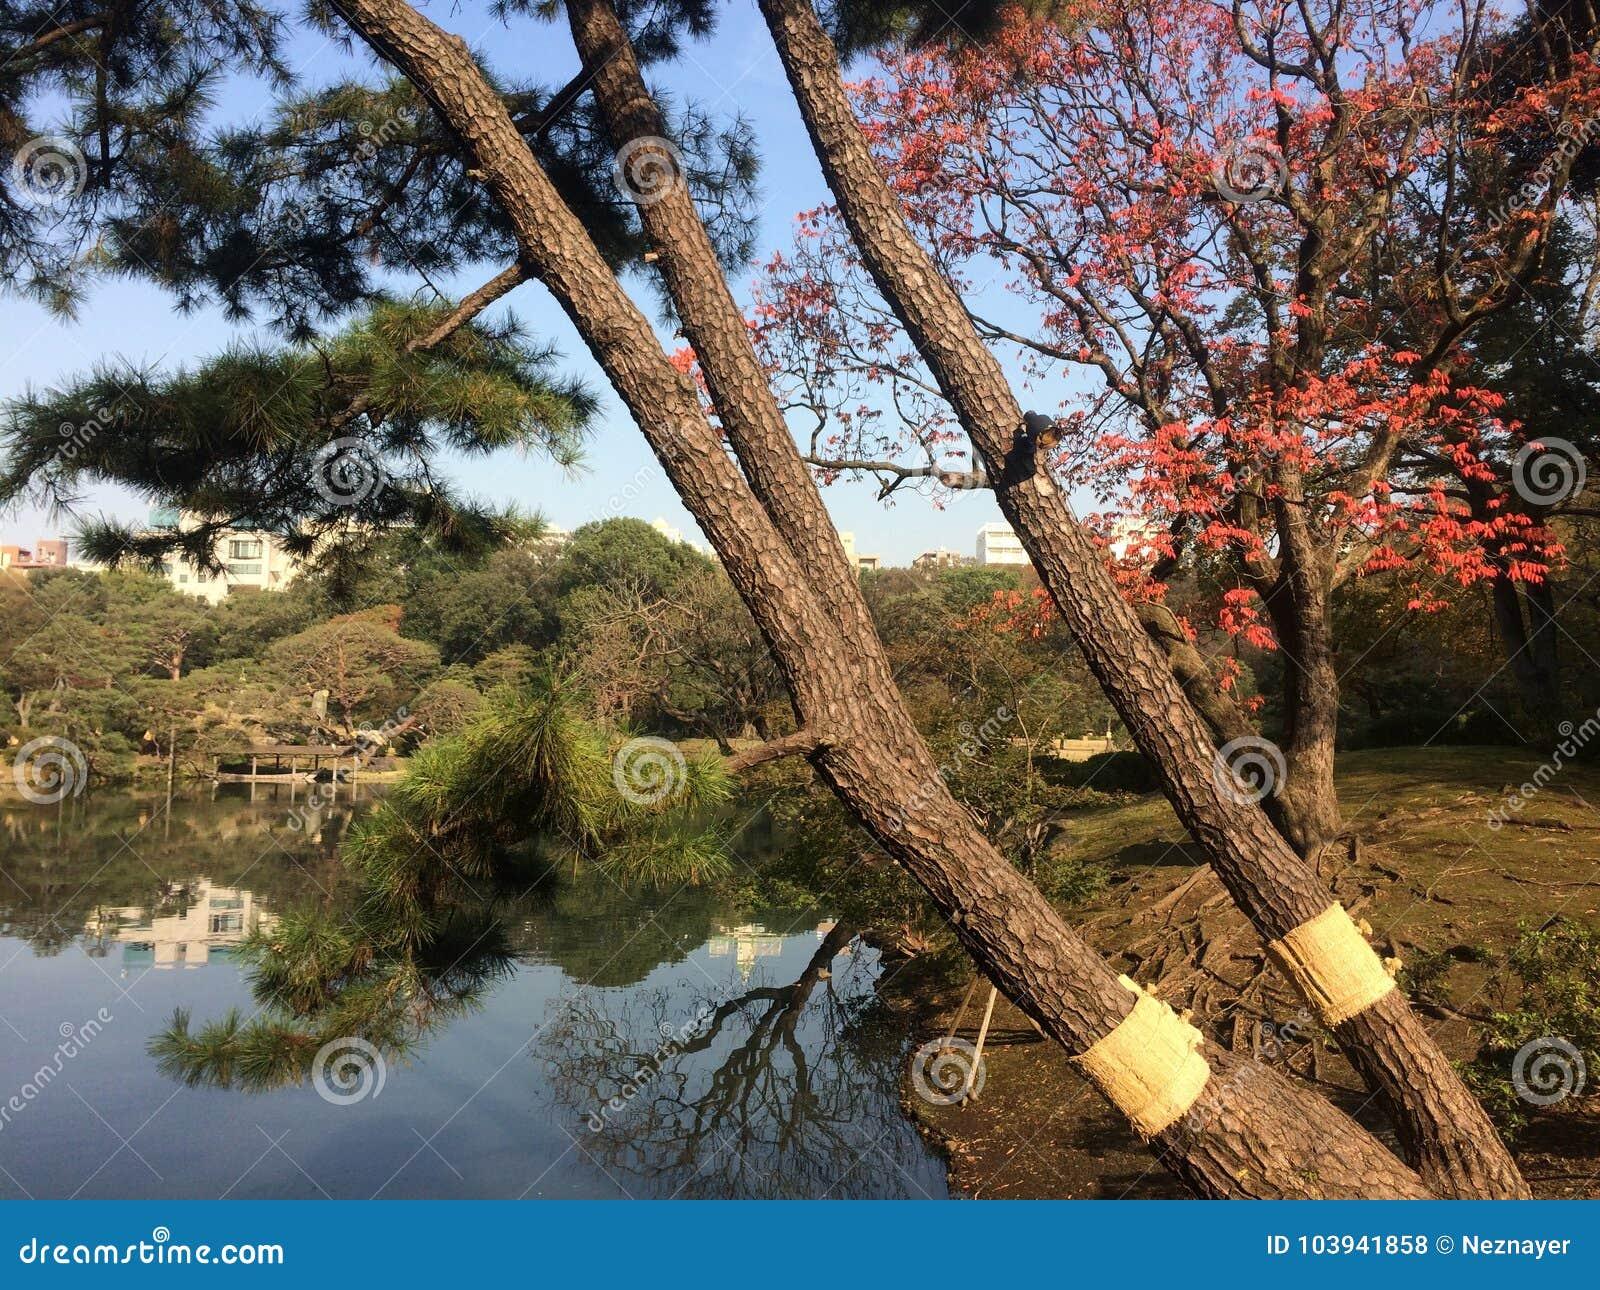 Japanese Pine Tree In Garden Stock Photo - Image of autumn ...